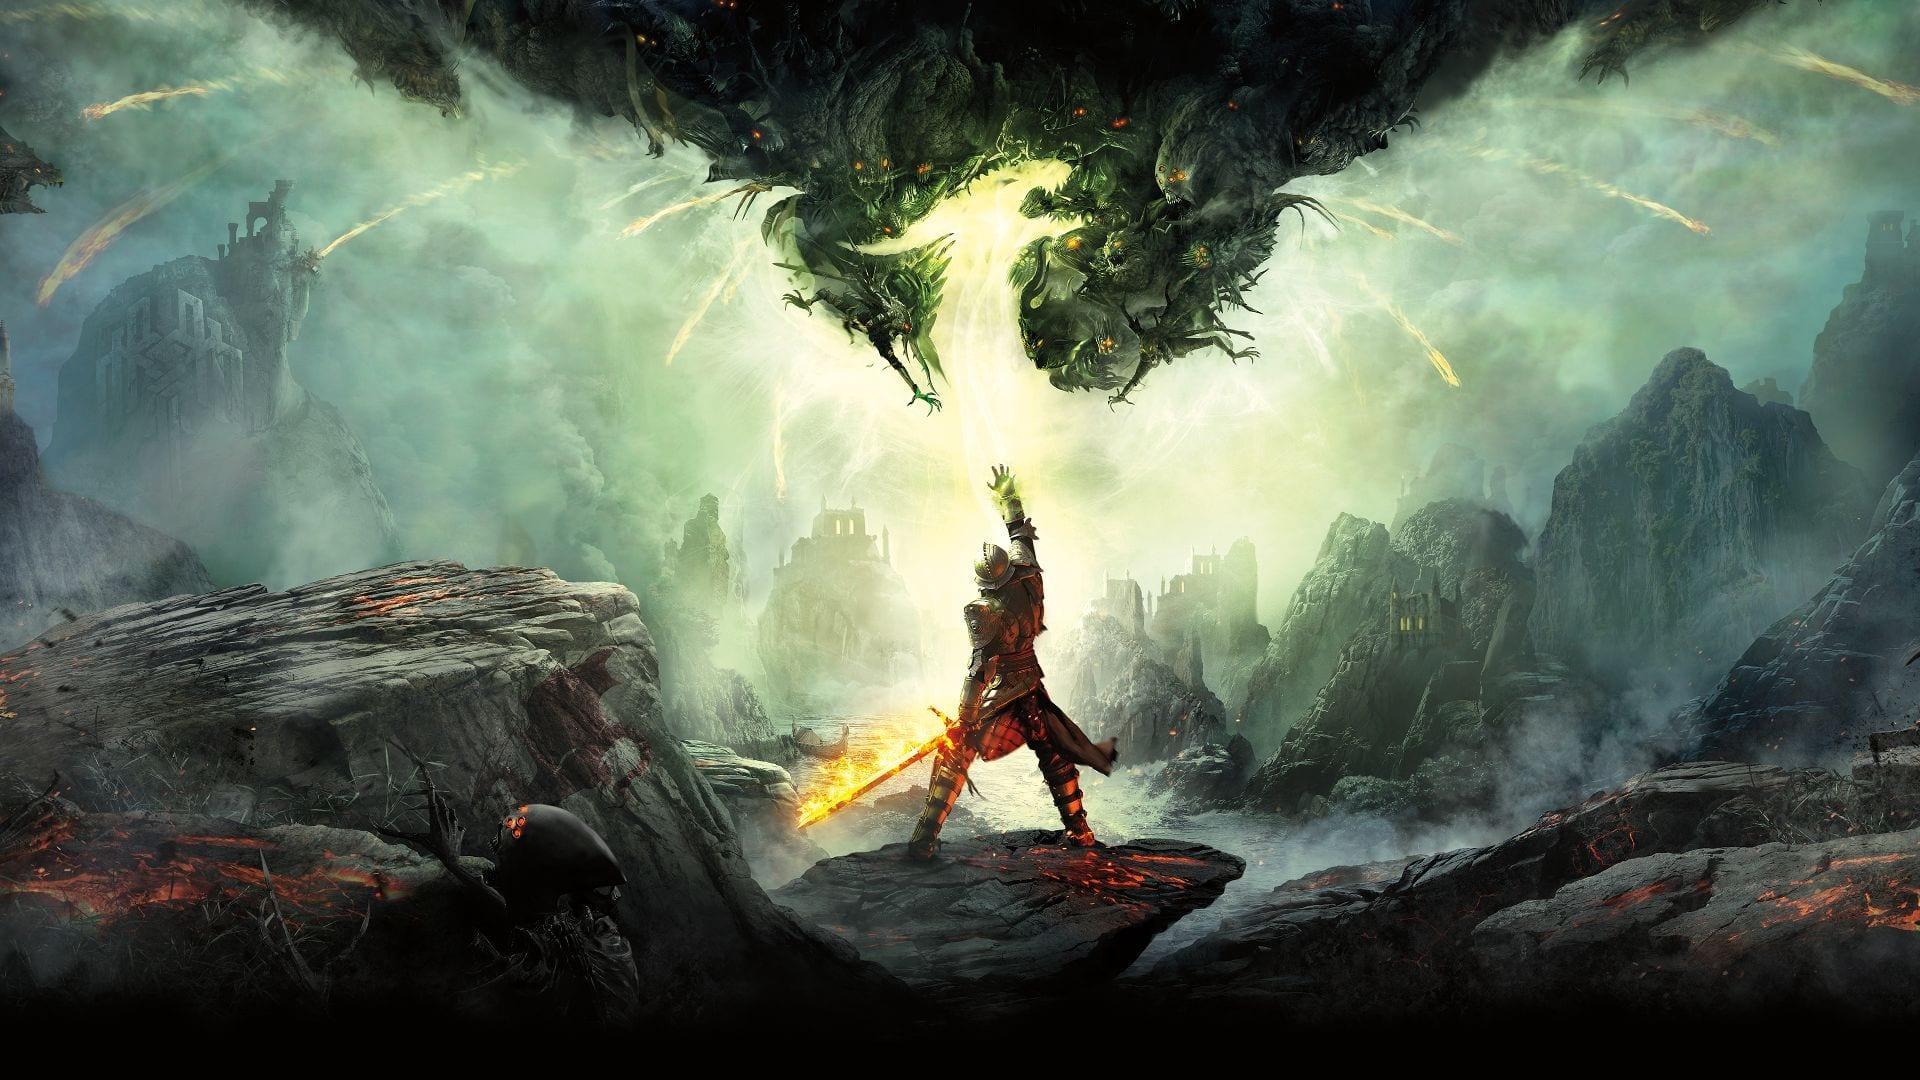 Dragon Age 4 big reveal